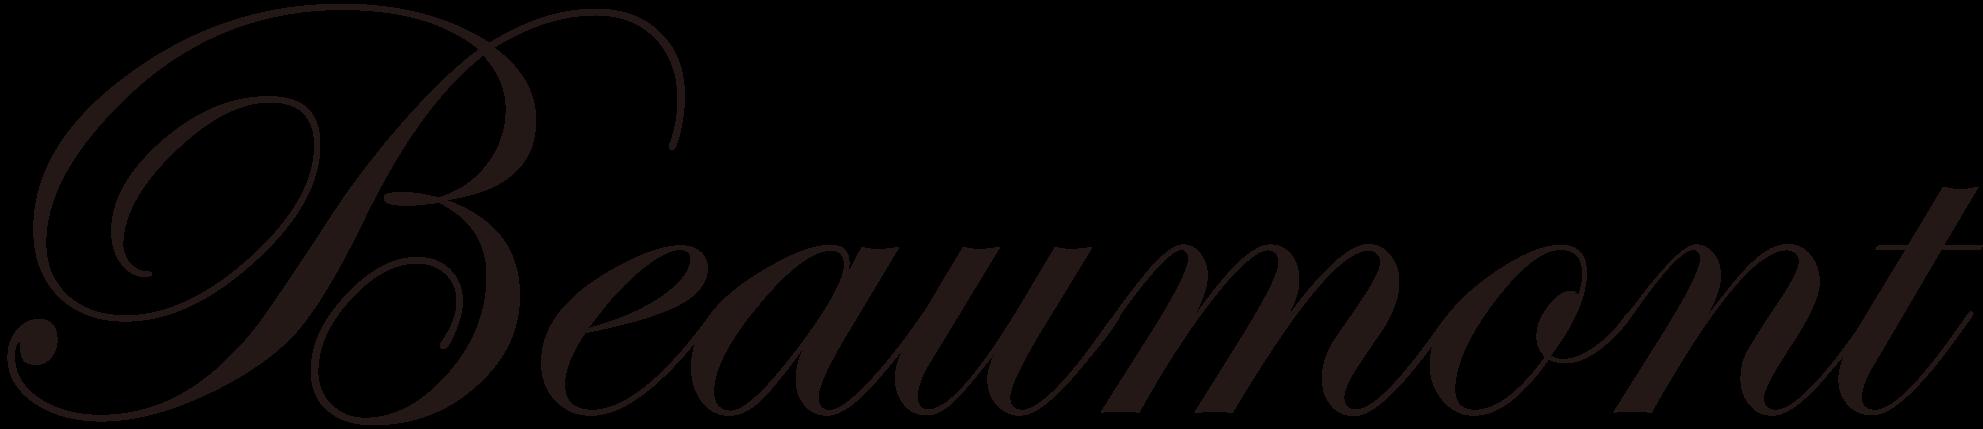 Beaumont | 野中貿易株式会社